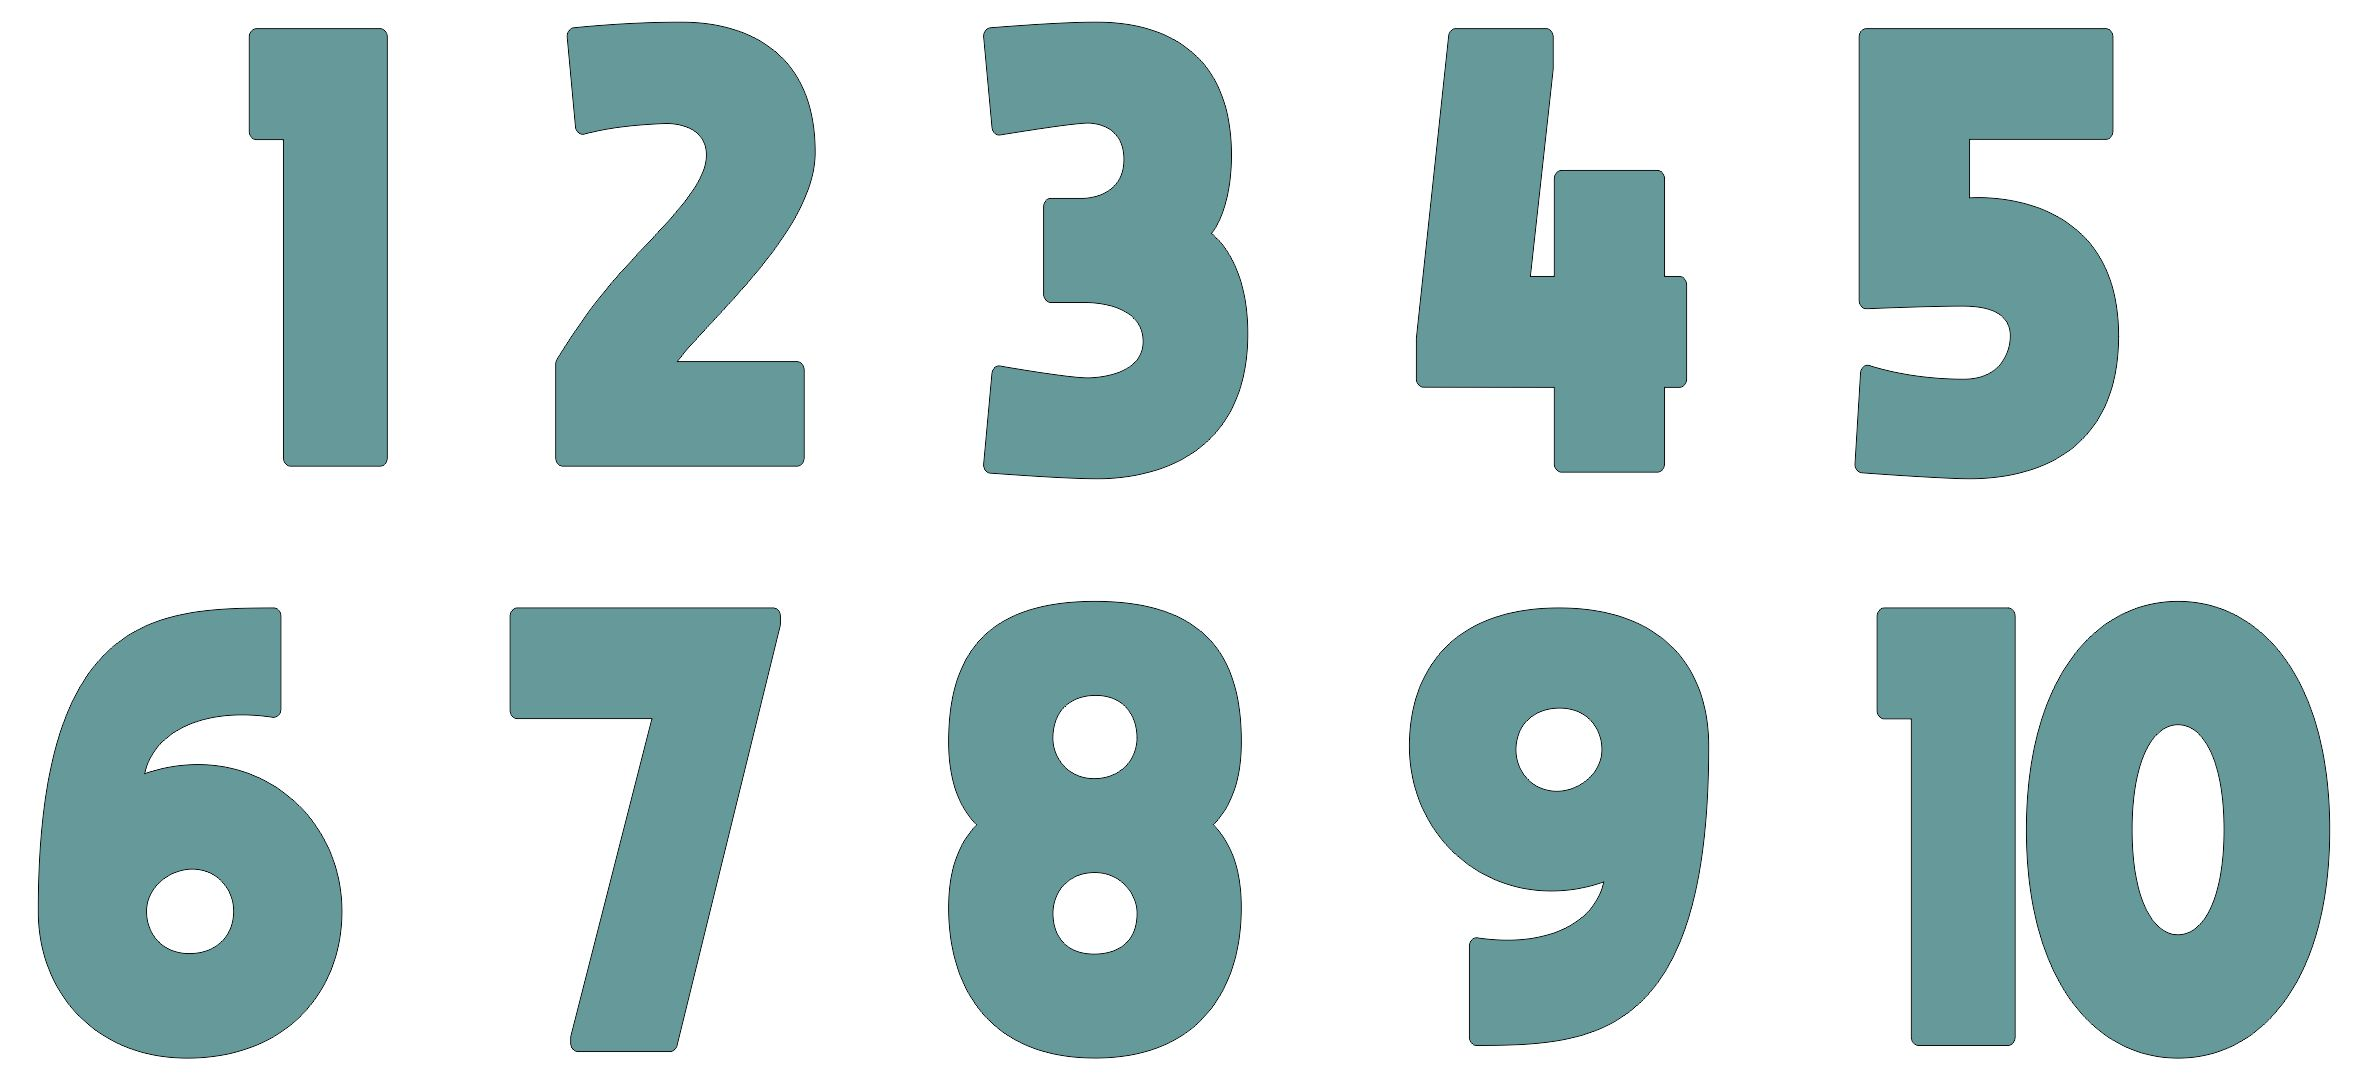 7 Best Images of Printable Number 2 - Free Printable ...